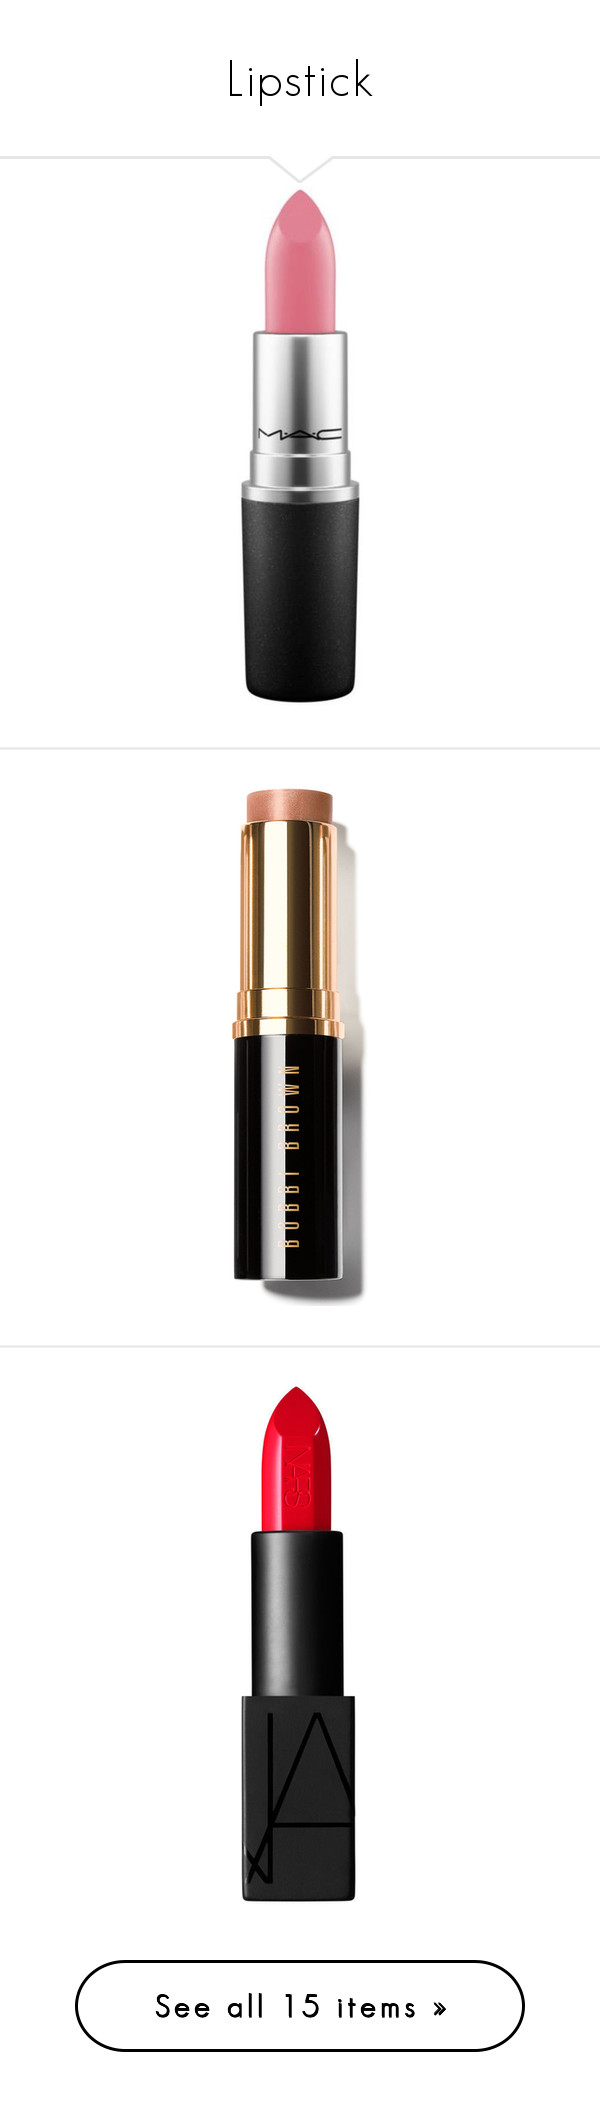 Lipstick by xo-nikita liked on Polyvore featuring beauty